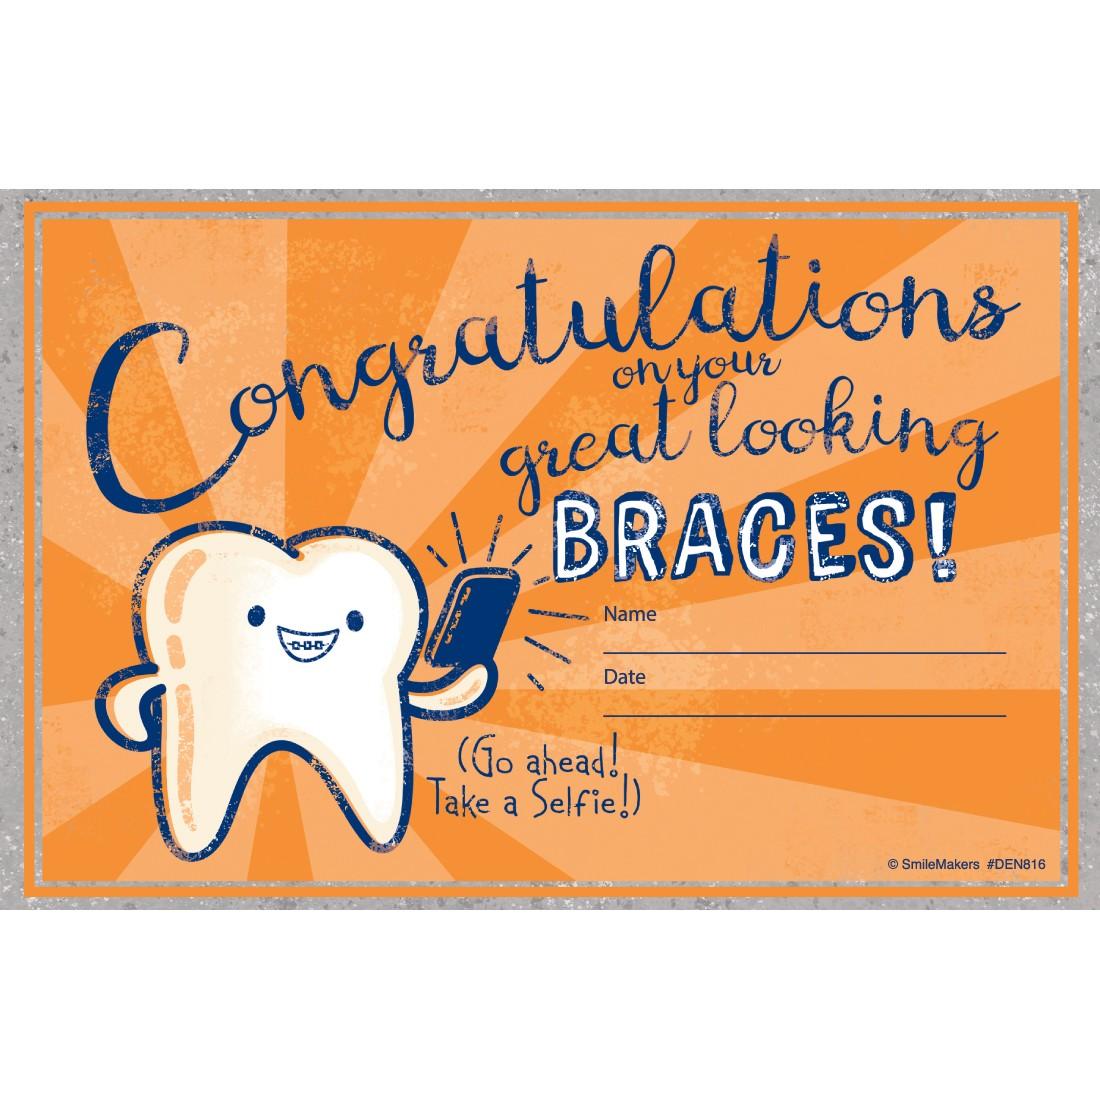 Congratulations on Braces Awards [image]